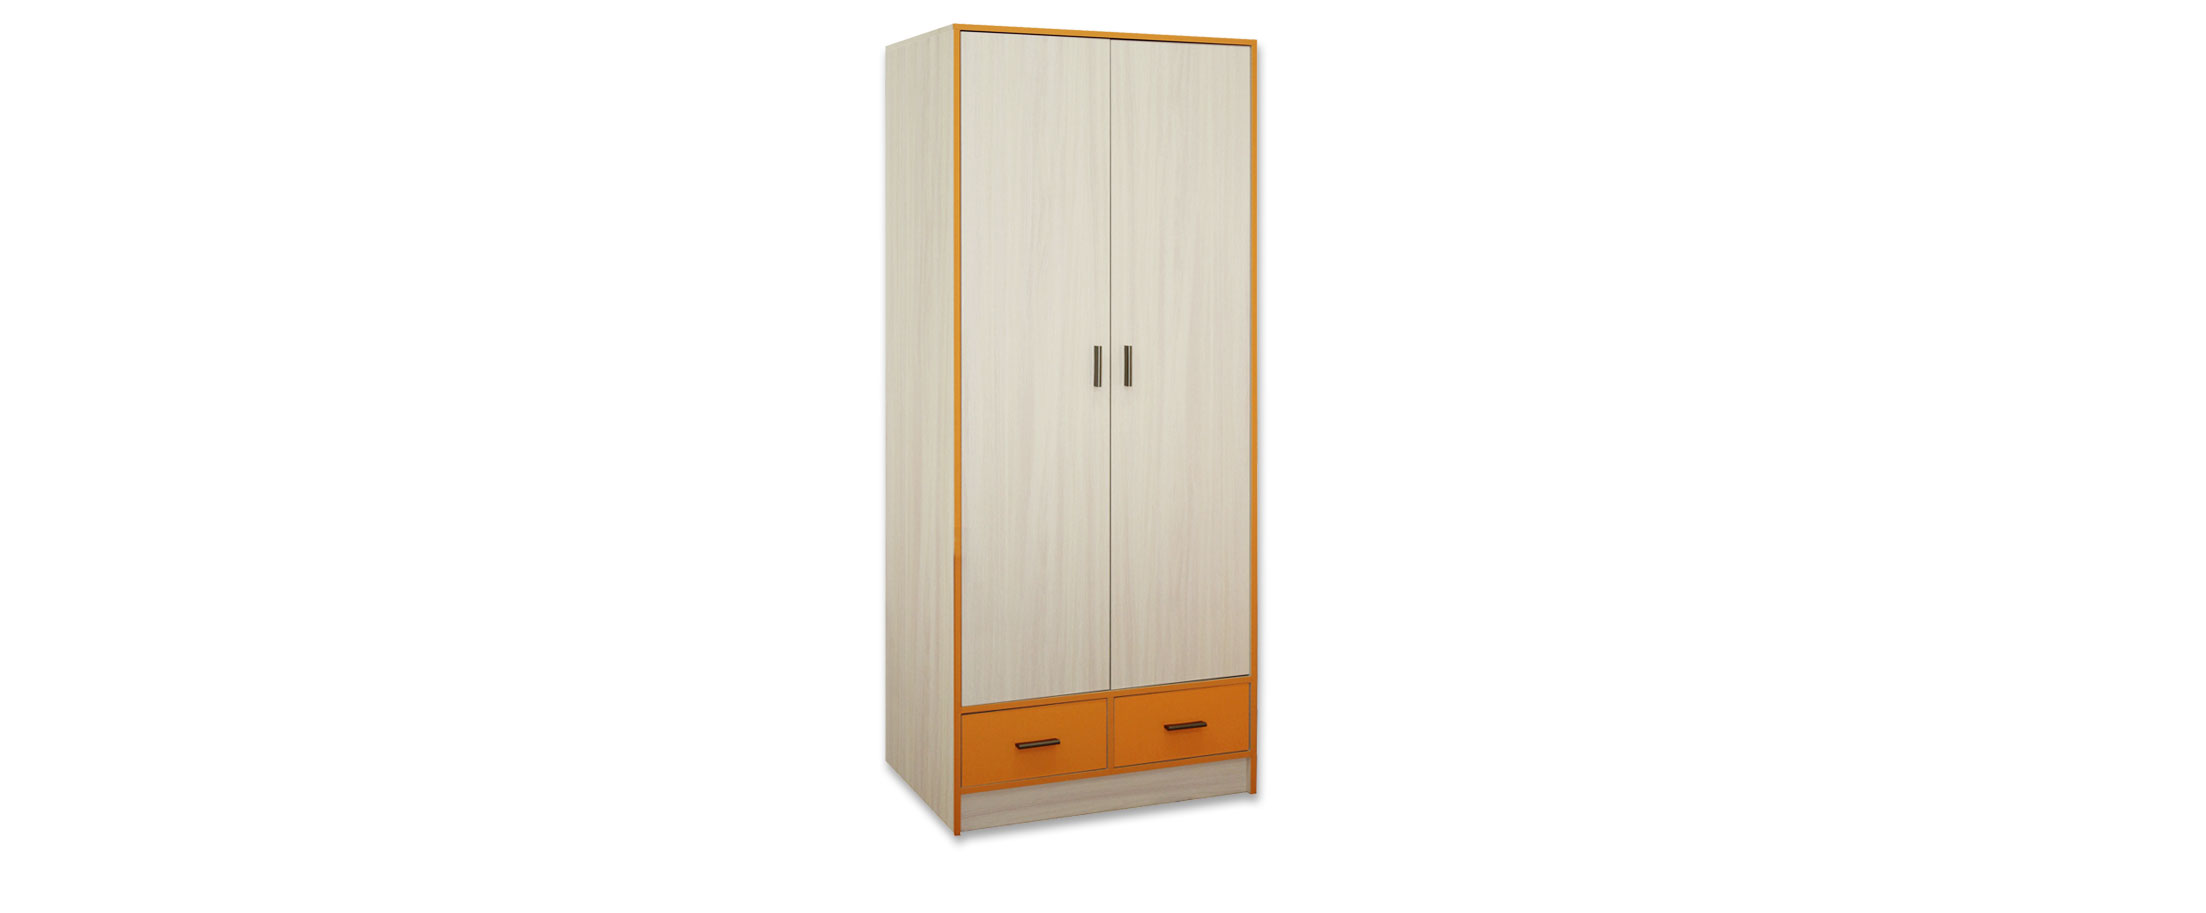 Шкаф для одежды Скейт-3 Модель 509 от MOON TRADE